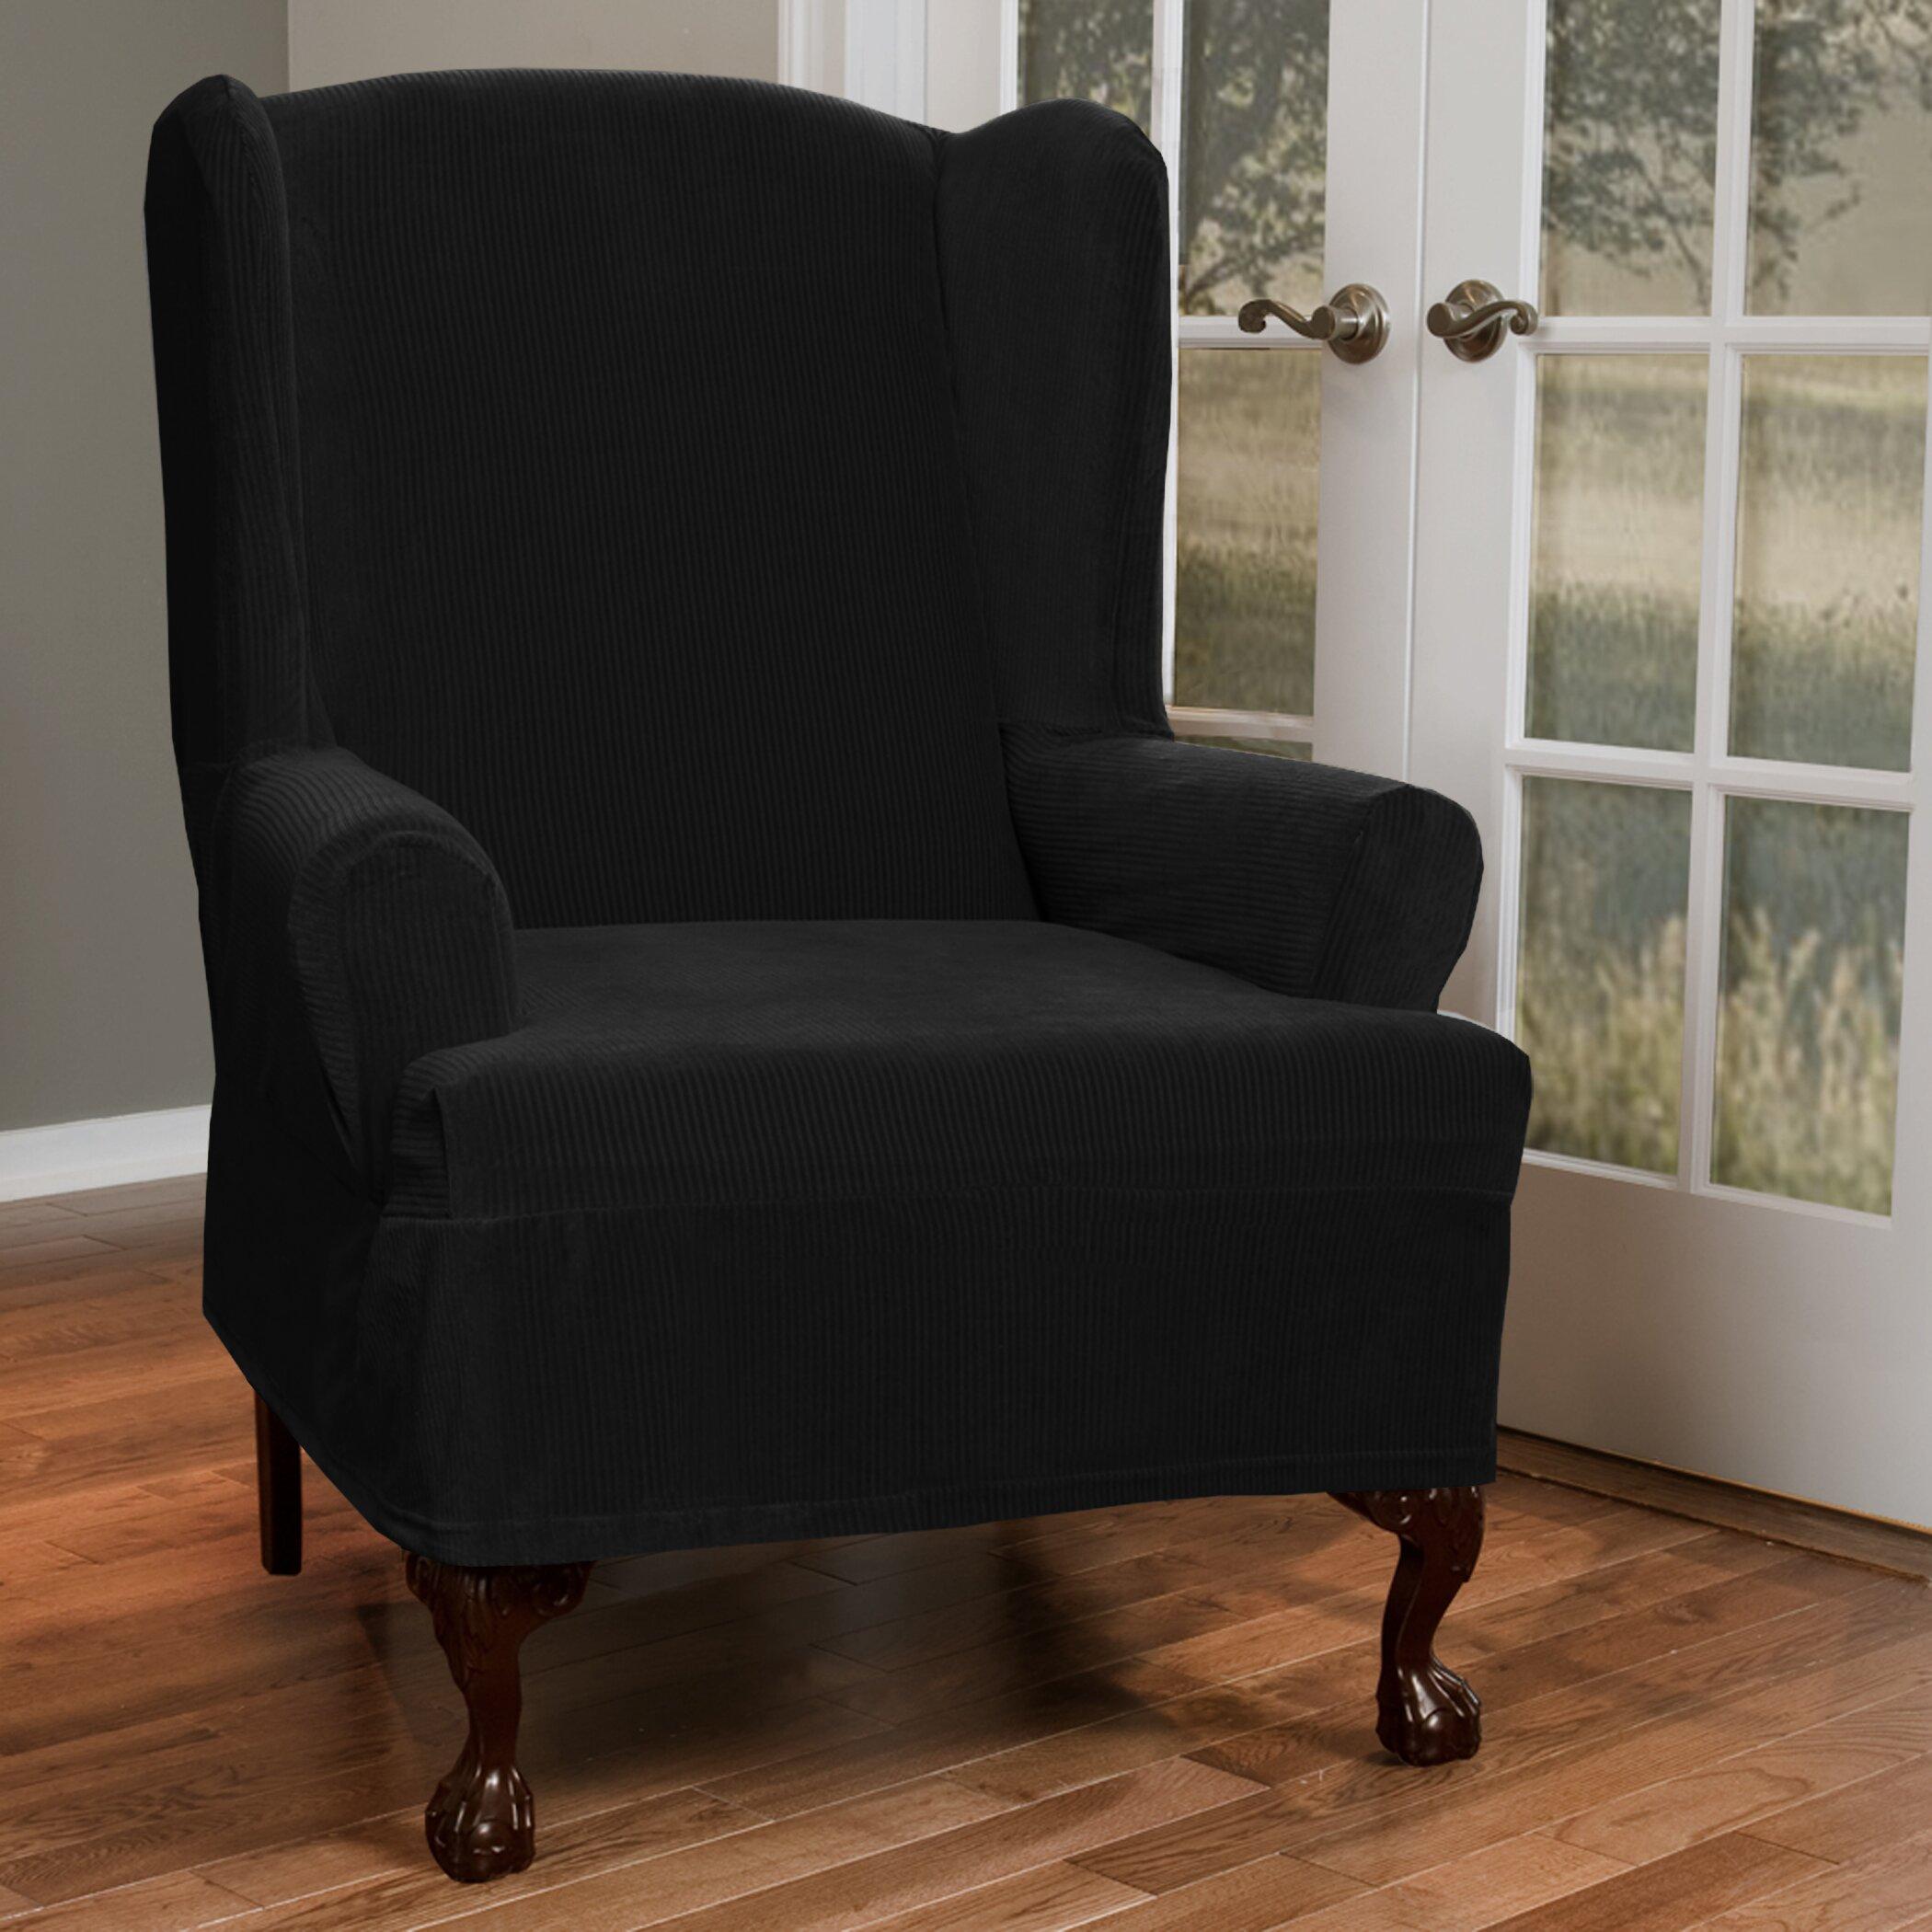 Maytex Collin Stretch T Cushion Wing Chair Slipcover